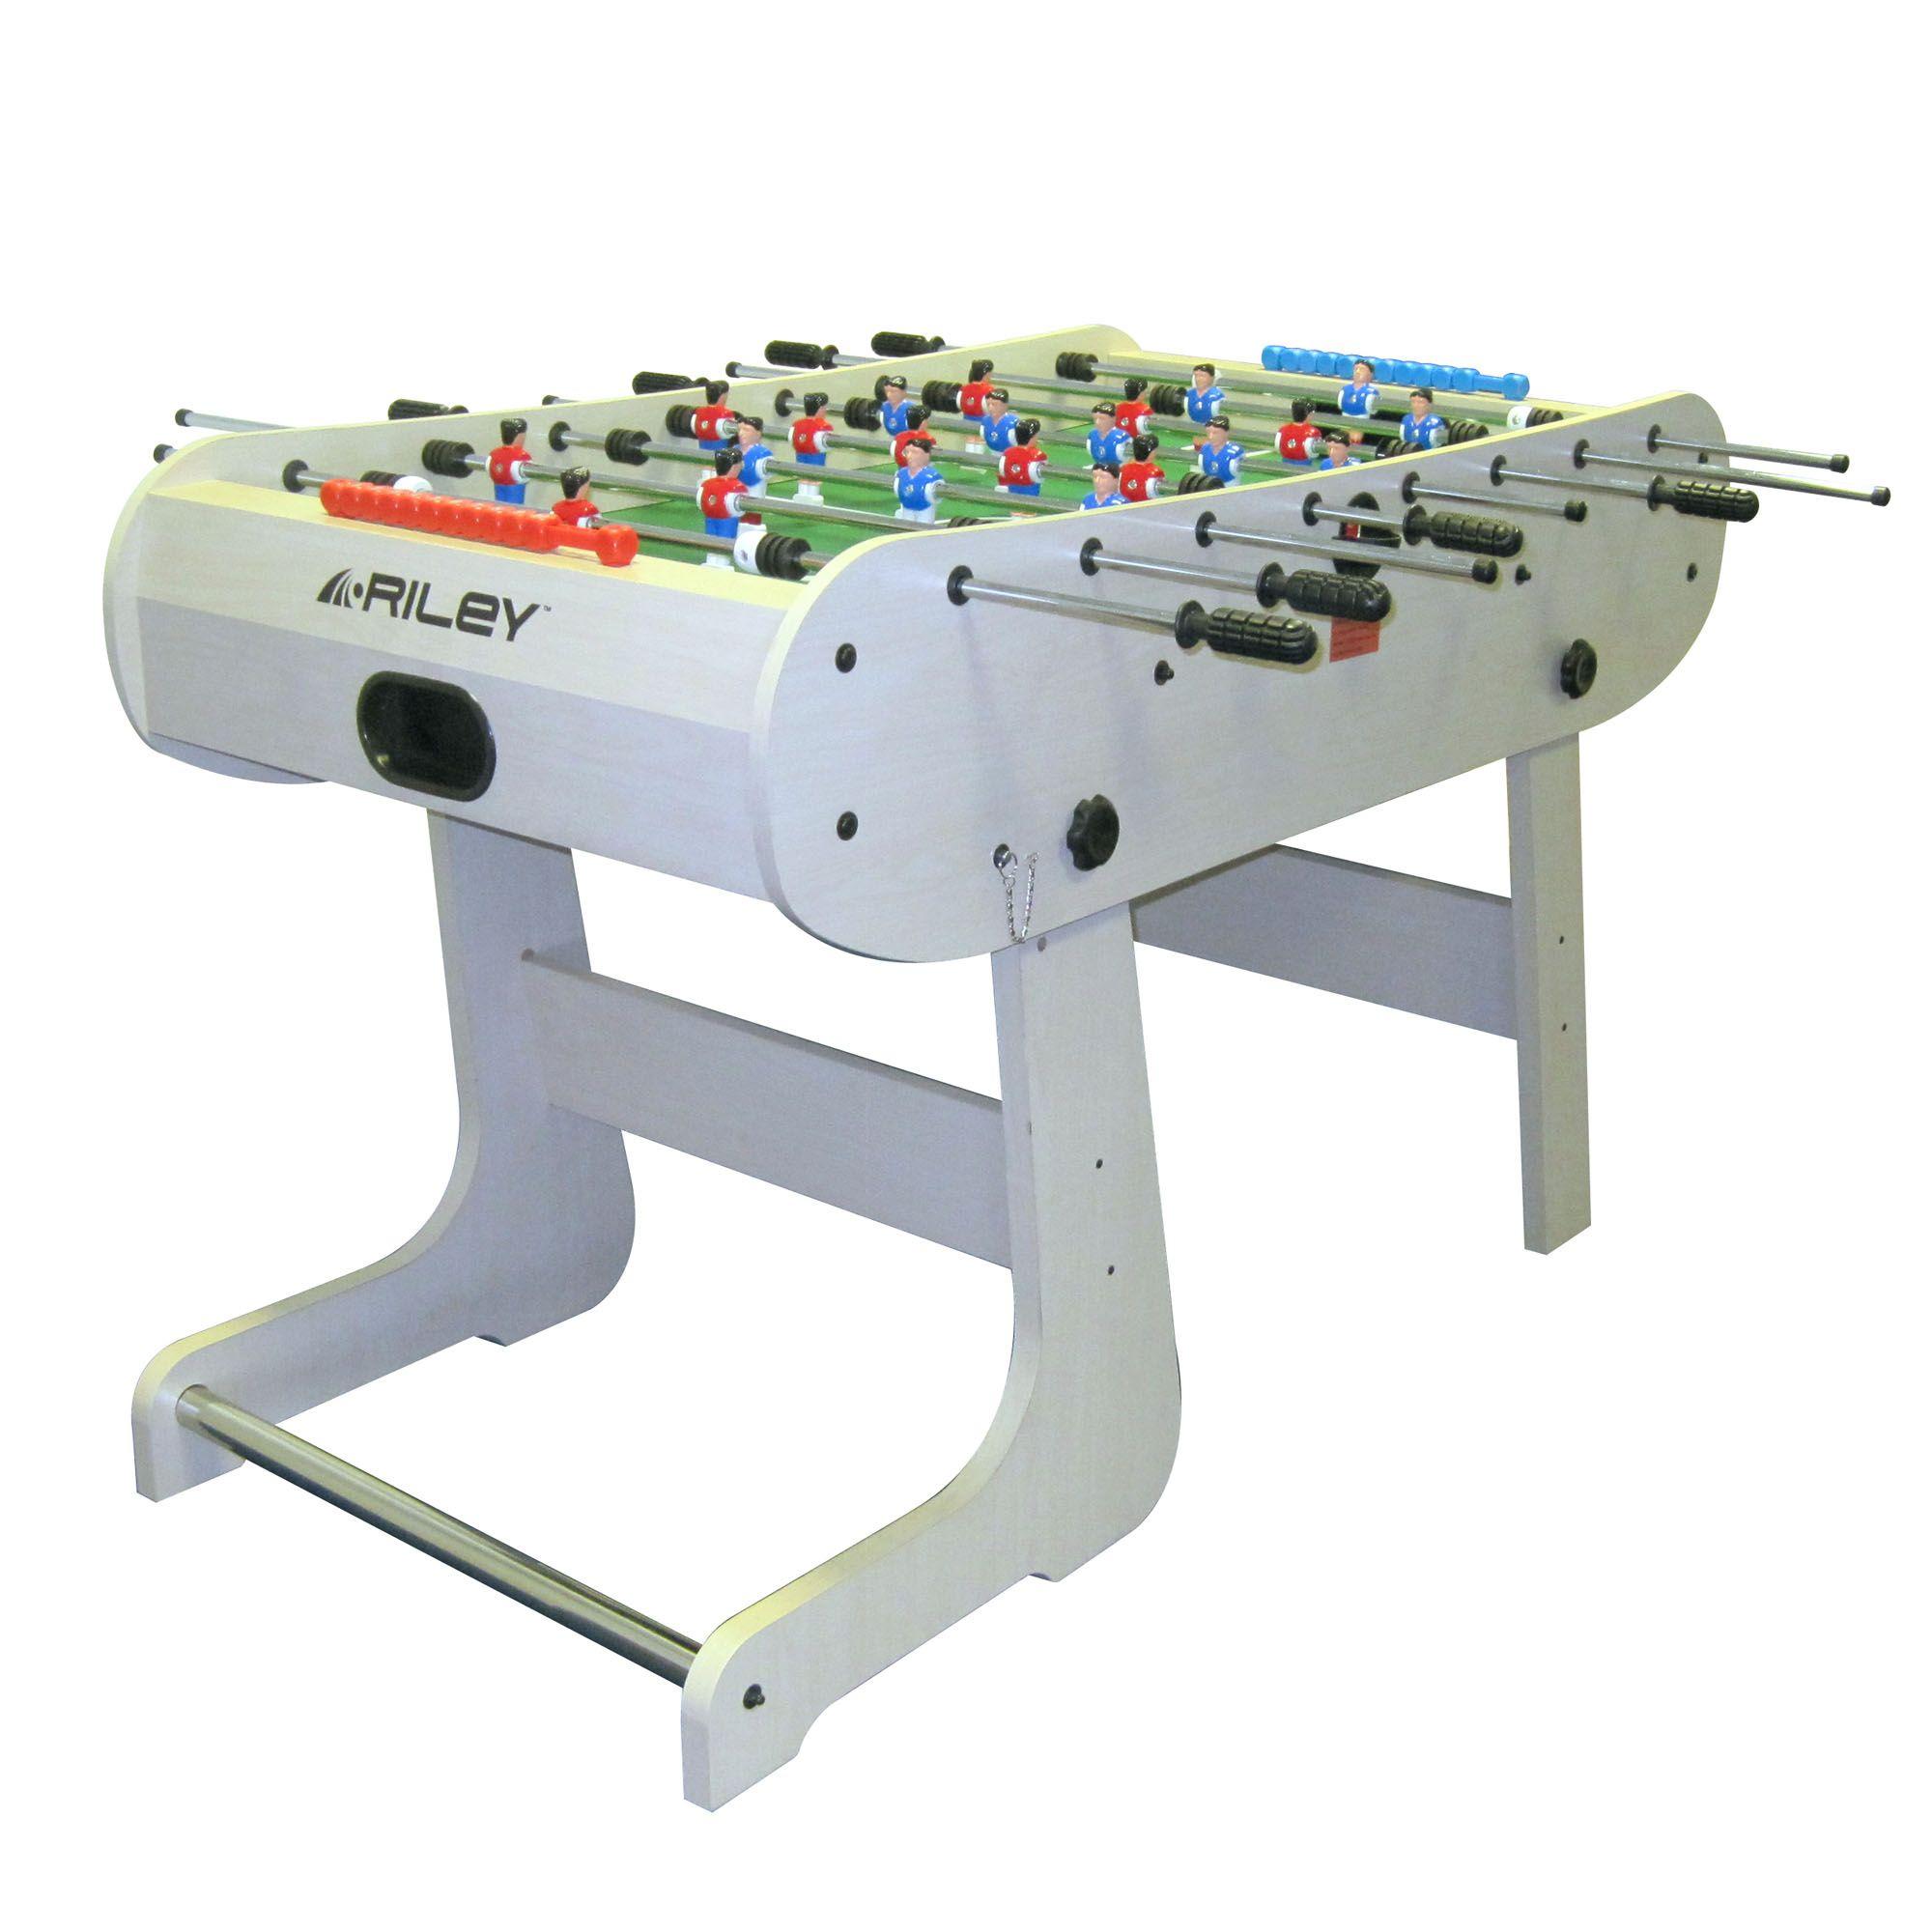 4ft Folding Table picture on riley 4ft 6 olympic folding football table with 4ft Folding Table, Folding Table c73f55e820975e0f3bfa33545ce34efb